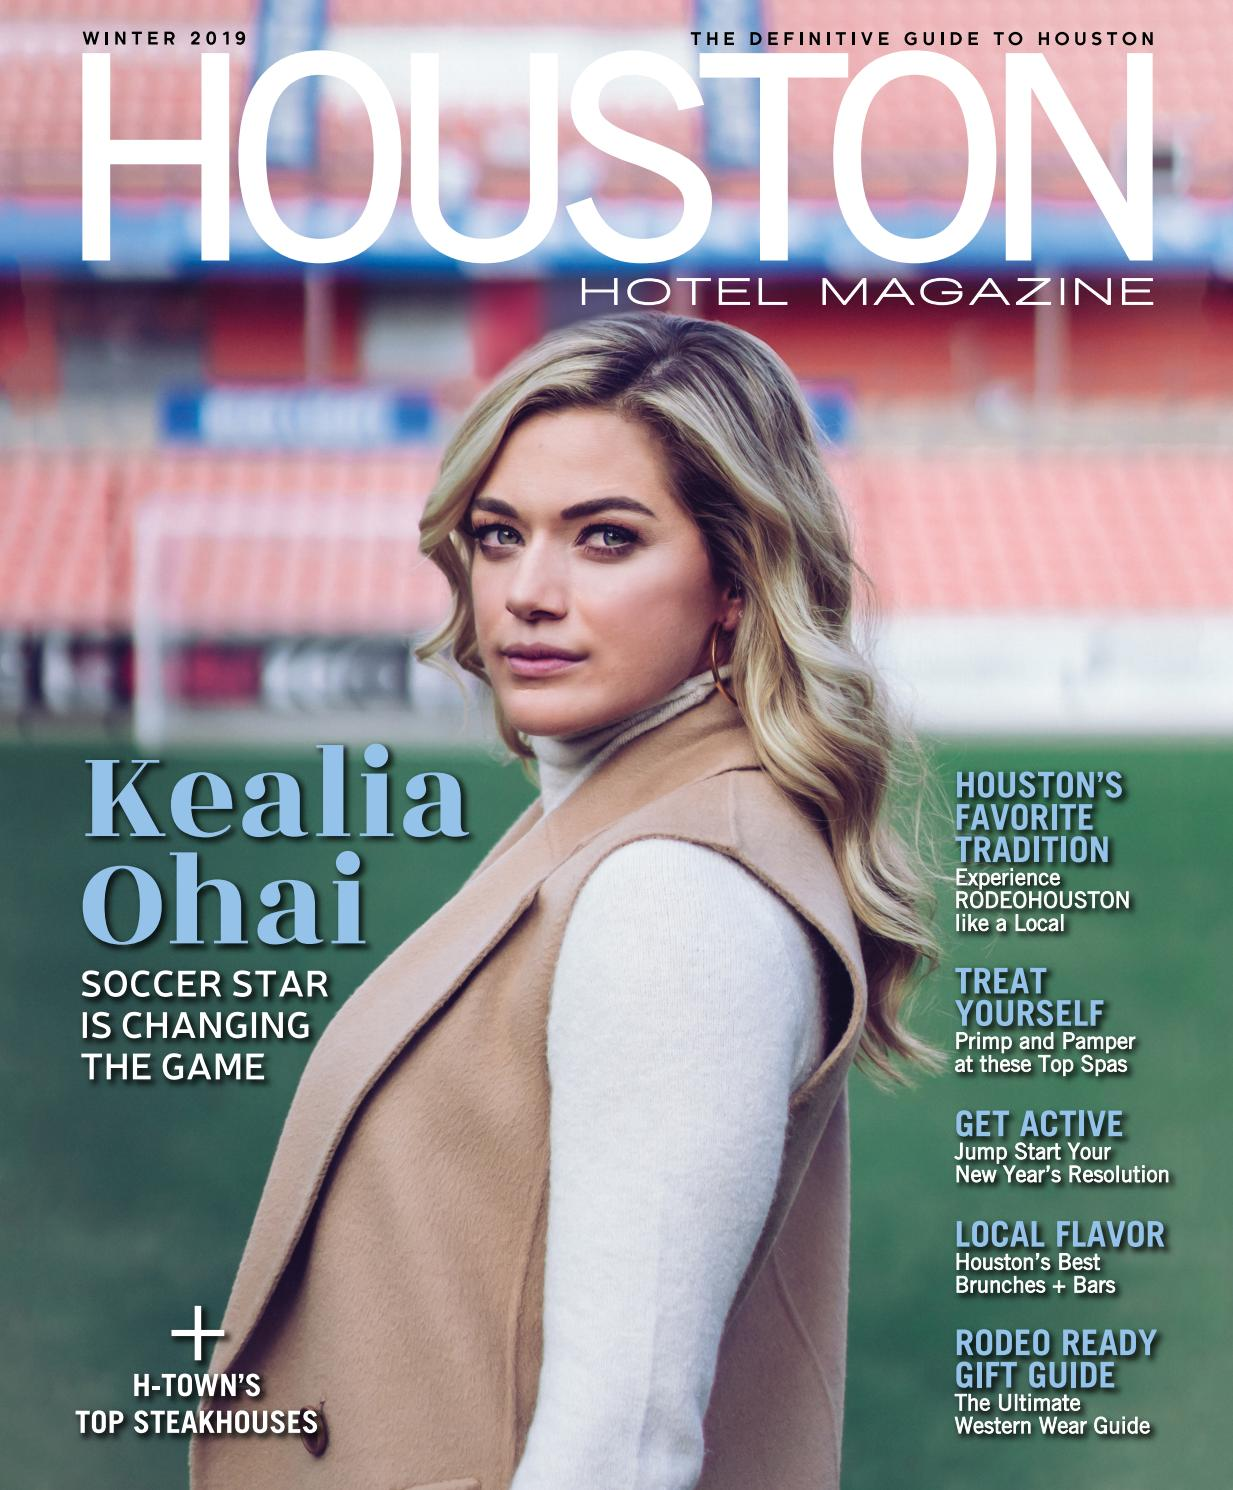 Houston Hotel Magazine Winter Issue 2019 by Dallas Hotel Magazine - issuu 0cc4004ffdf2